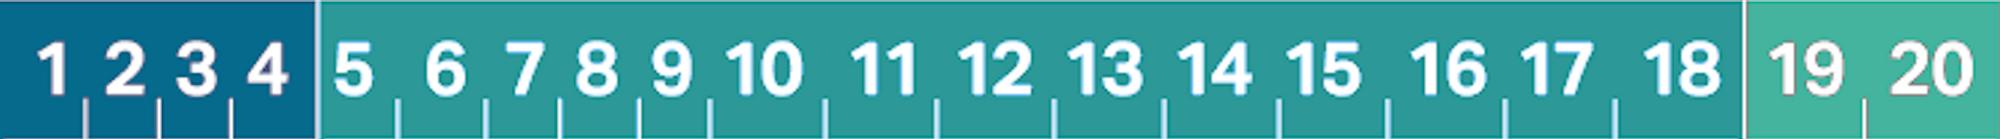 Colored, 20-digit alphanumeric universal company ID